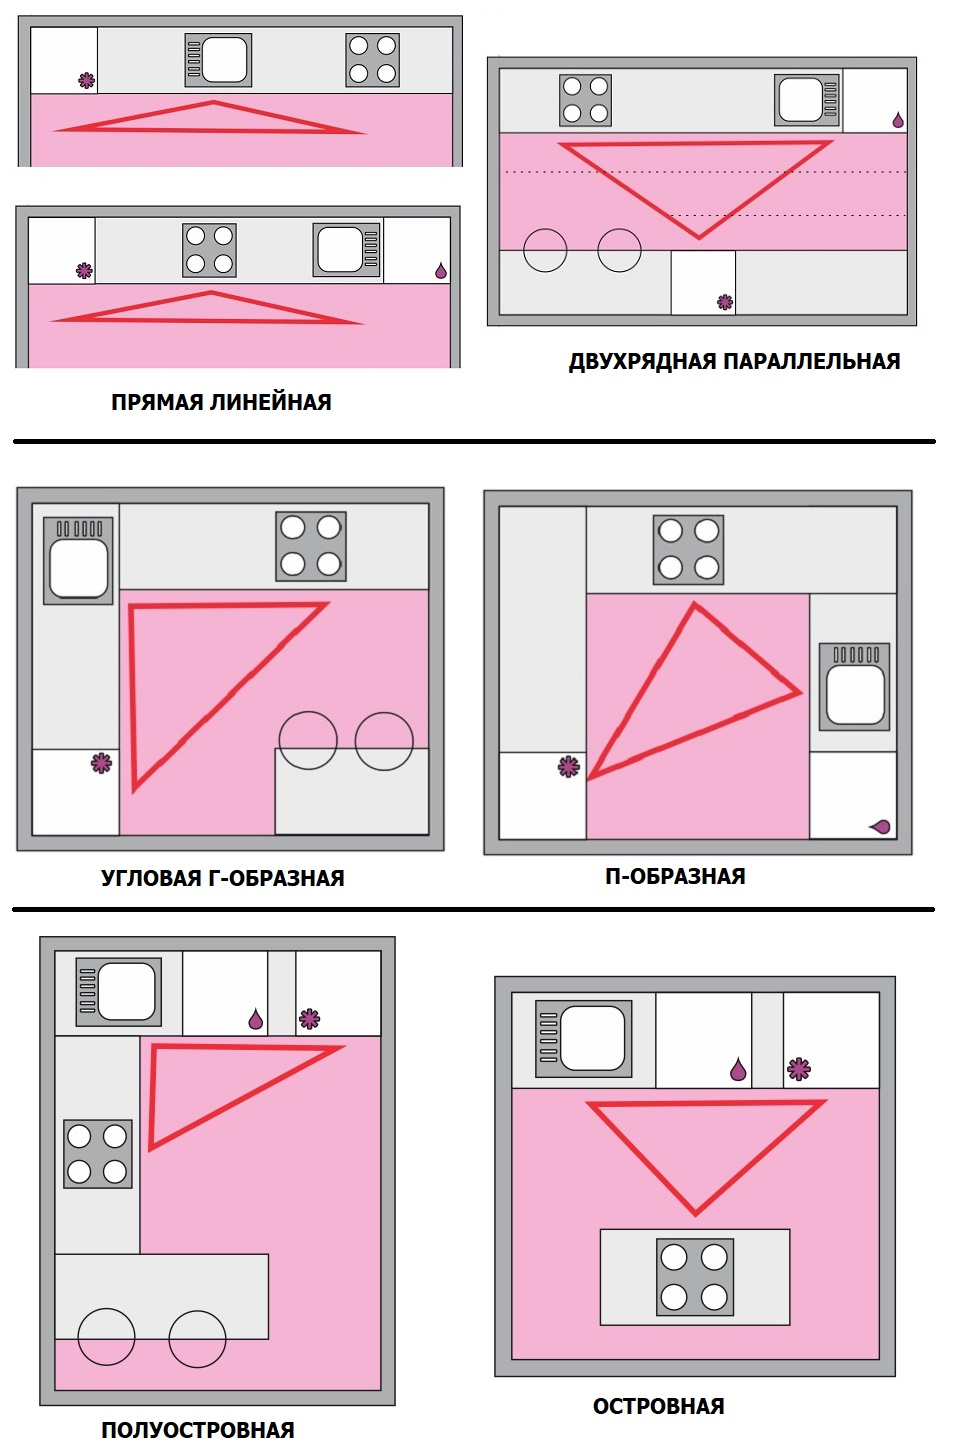 планировка кухни вид сверху чертеж